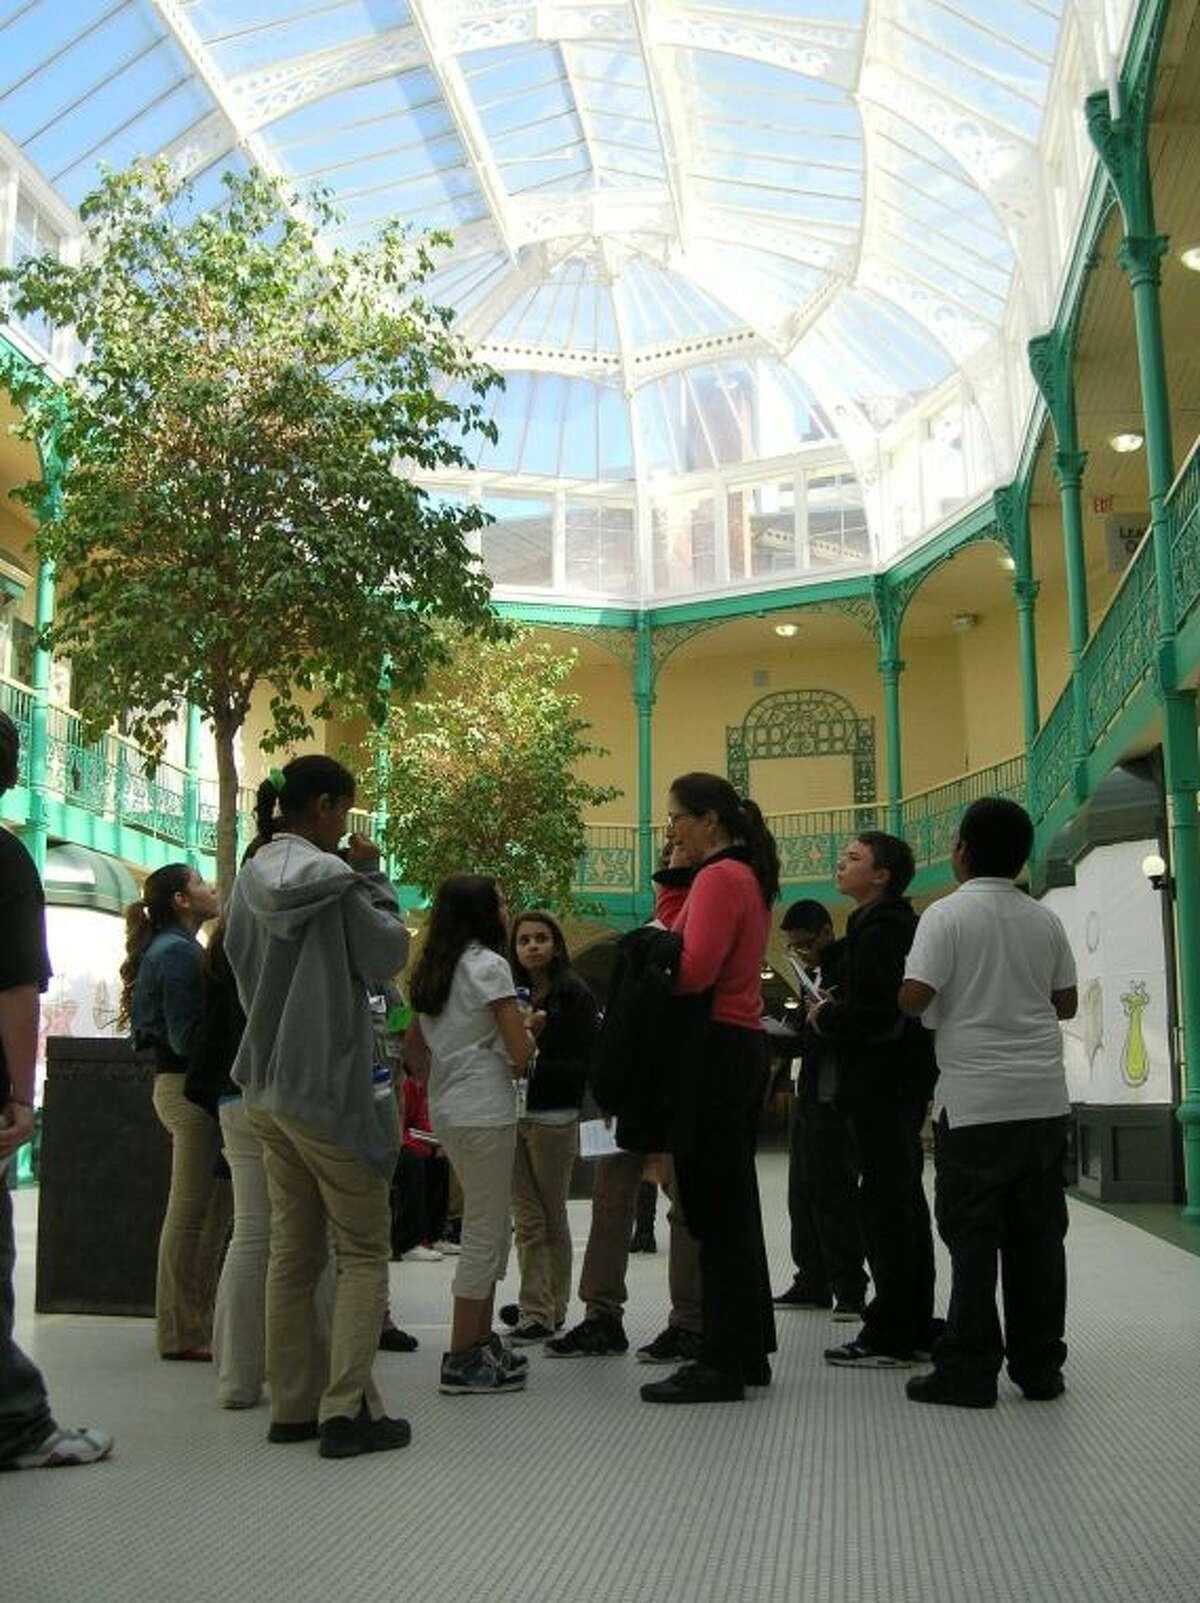 Peer Docents view the Arcade in Downtown Bridgeport